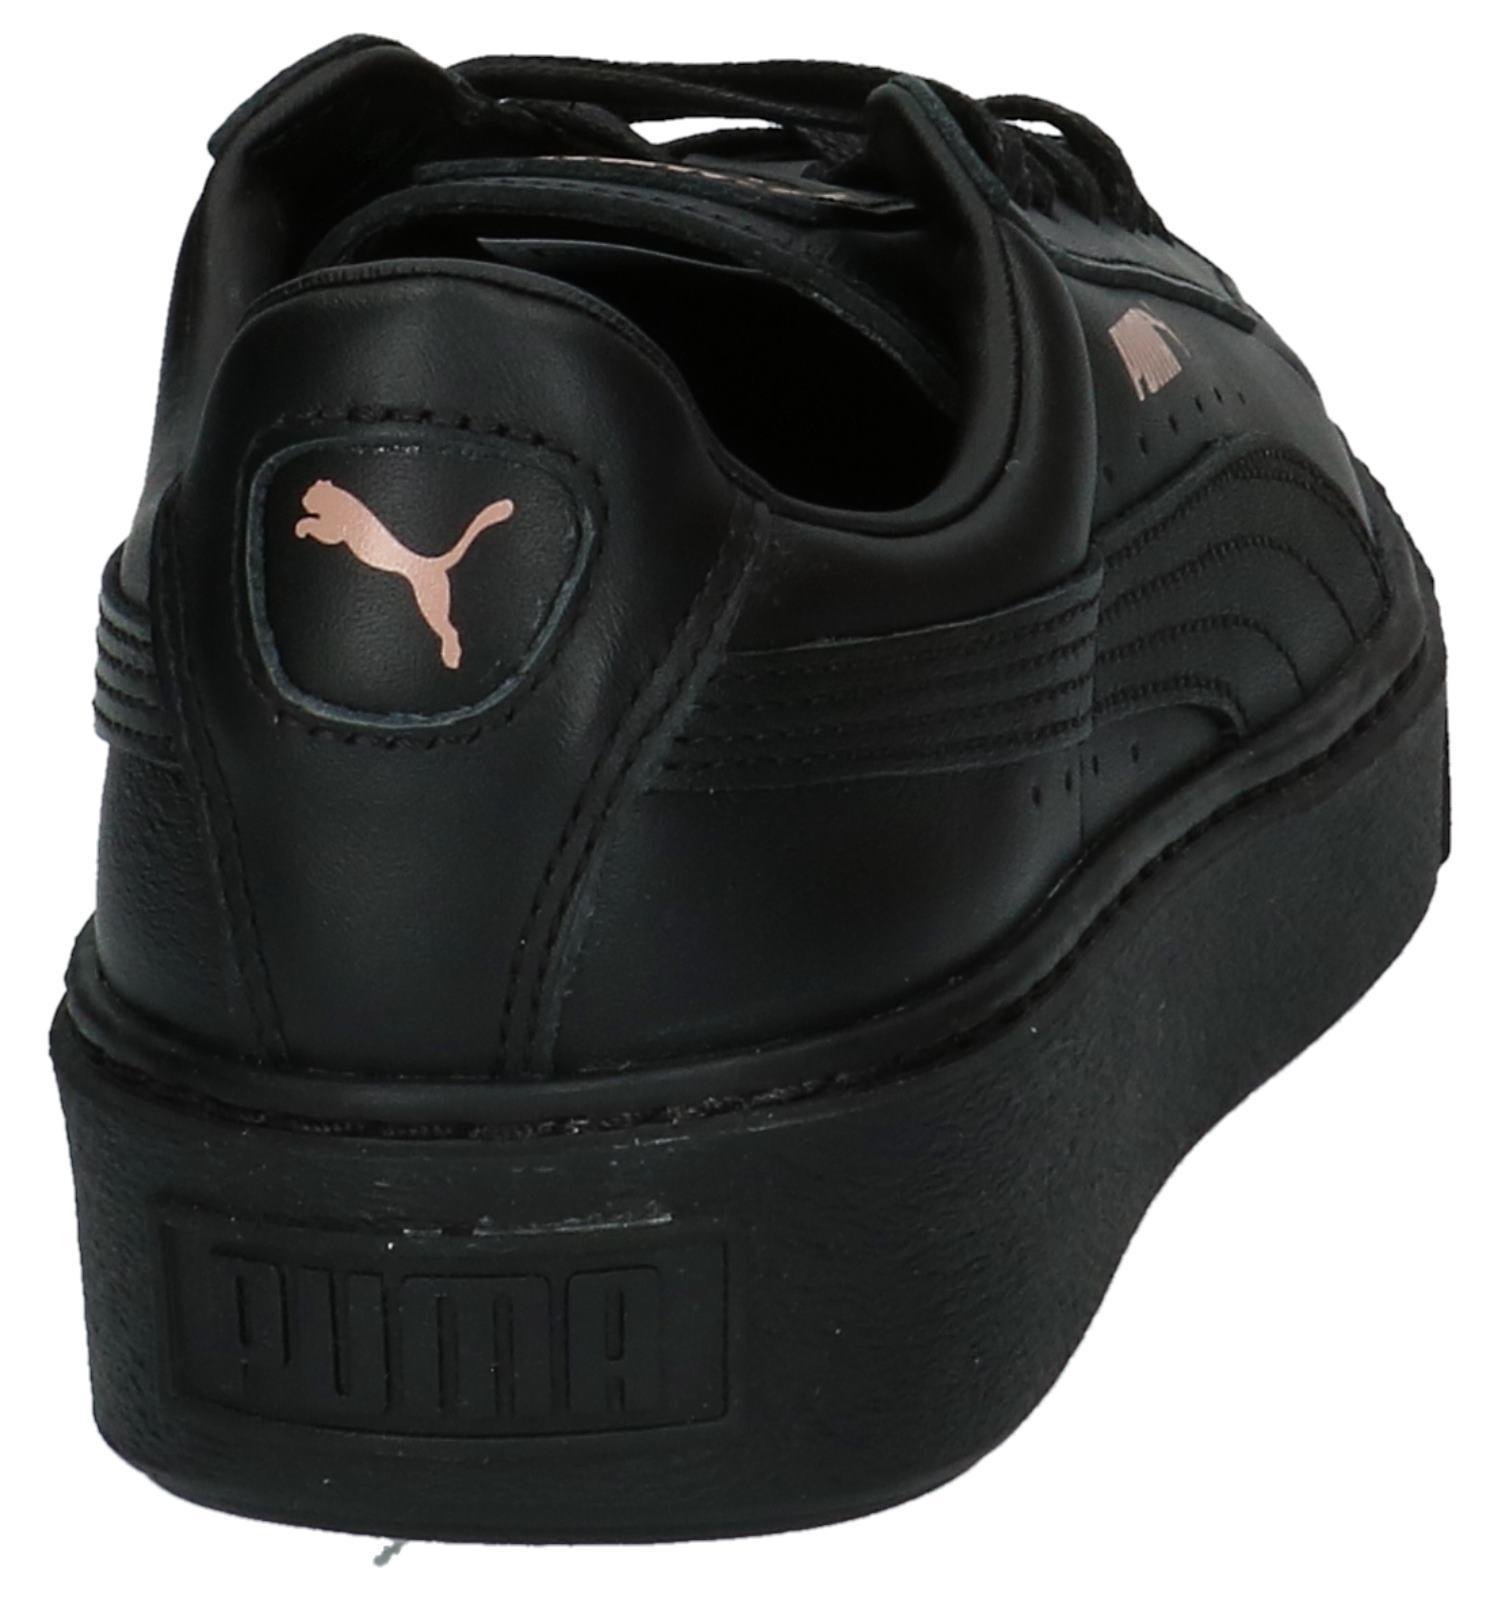 38a4aeeab90 Zwarte Puma Basket Platform Lage Sportieve Sneakers   TORFS.BE   Gratis  verzend en retour